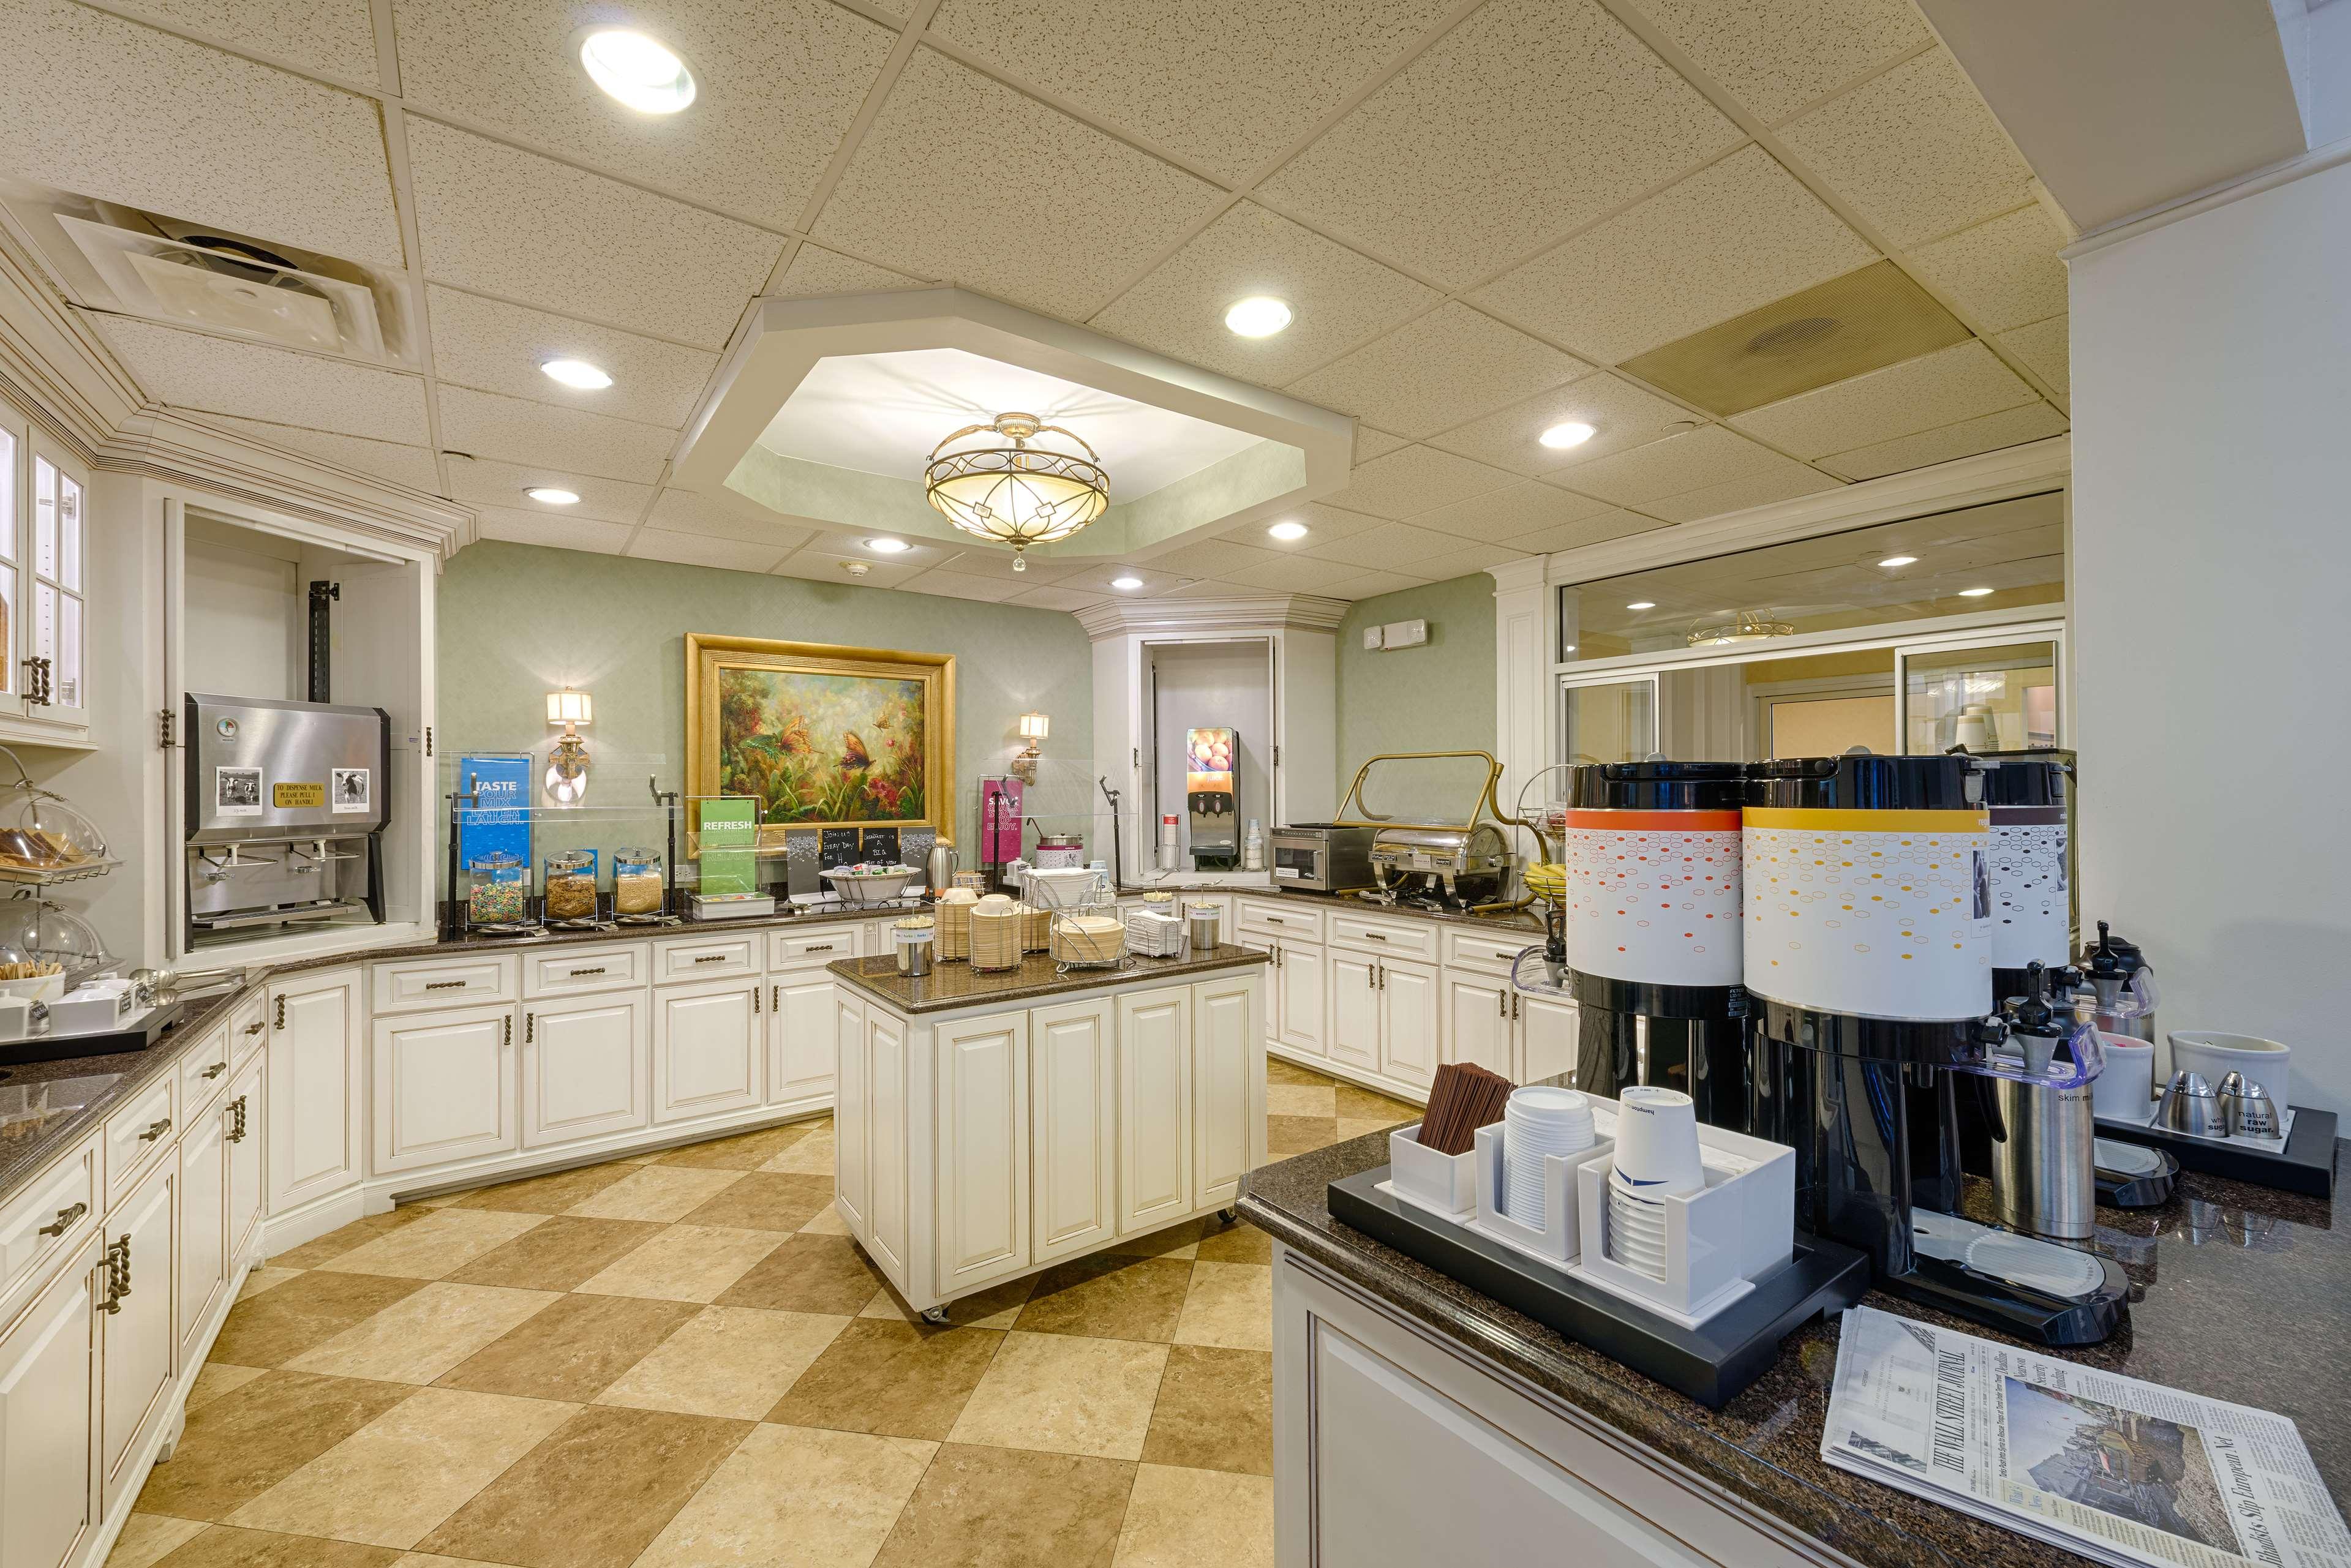 Hampton Inn & Suites Charlotte/South Park at Phillips Place image 11